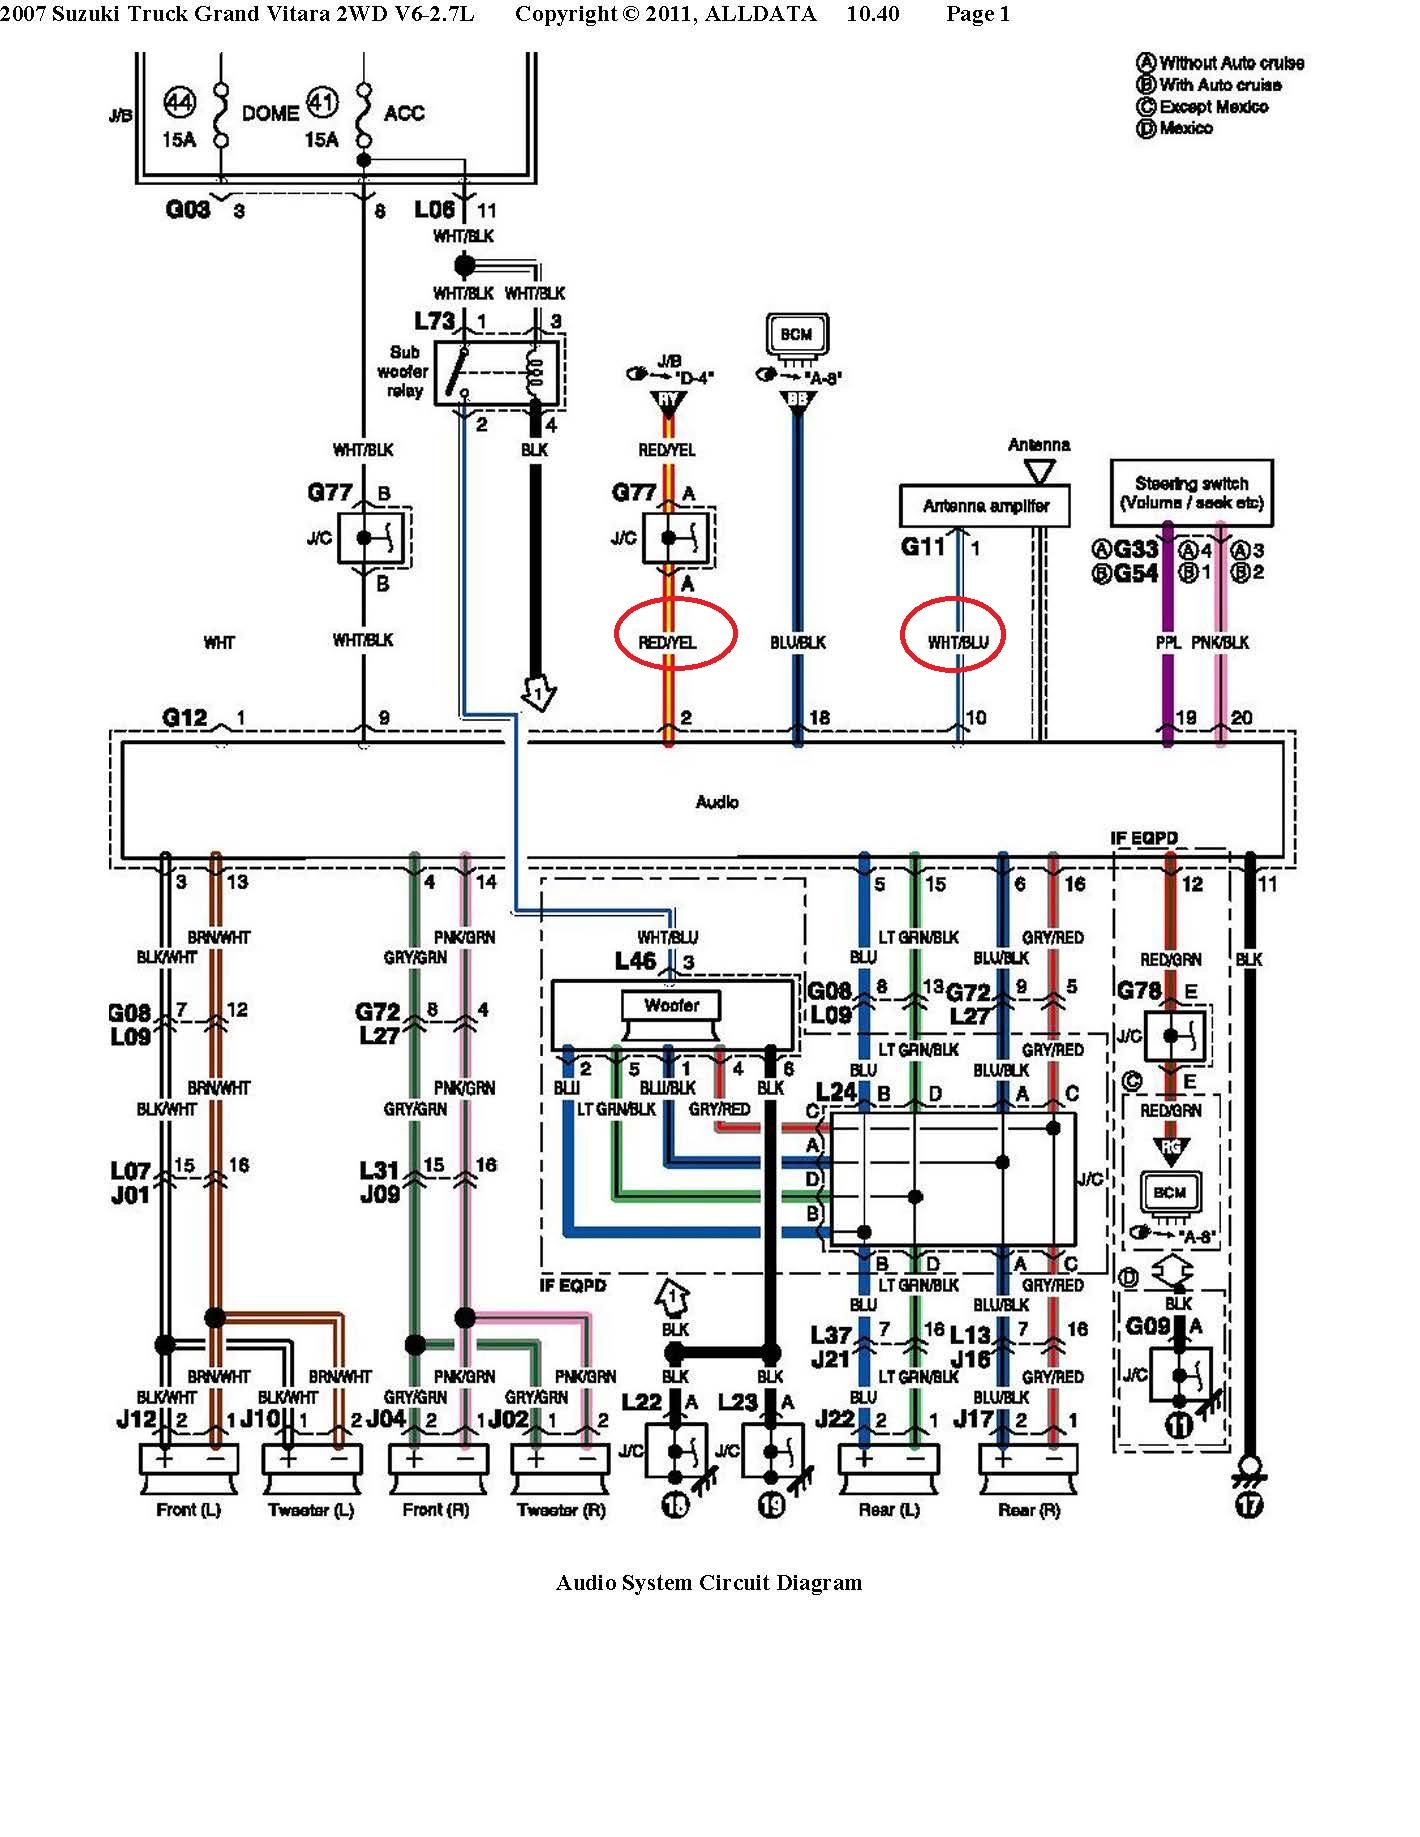 suzuki baleno wiring diagram wiring diagram rh wiring1 ennosbobbelparty1 de